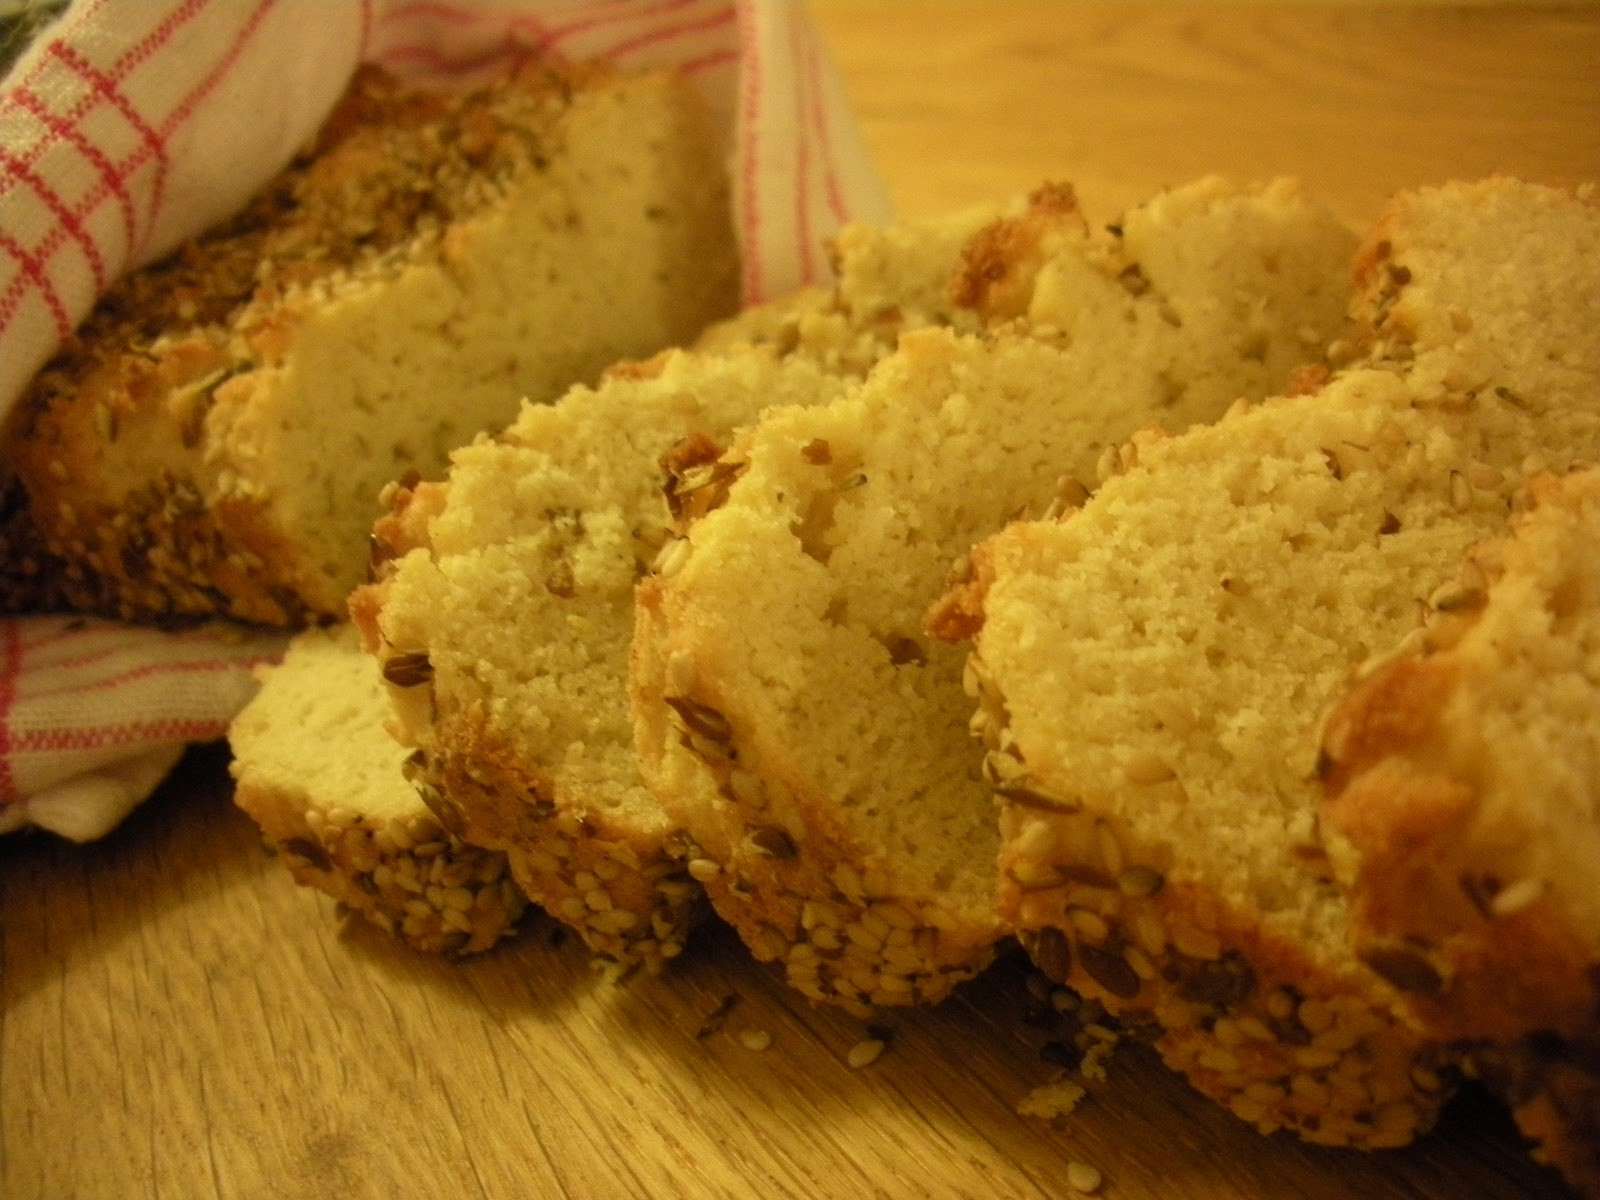 bröd med kokosmjöl